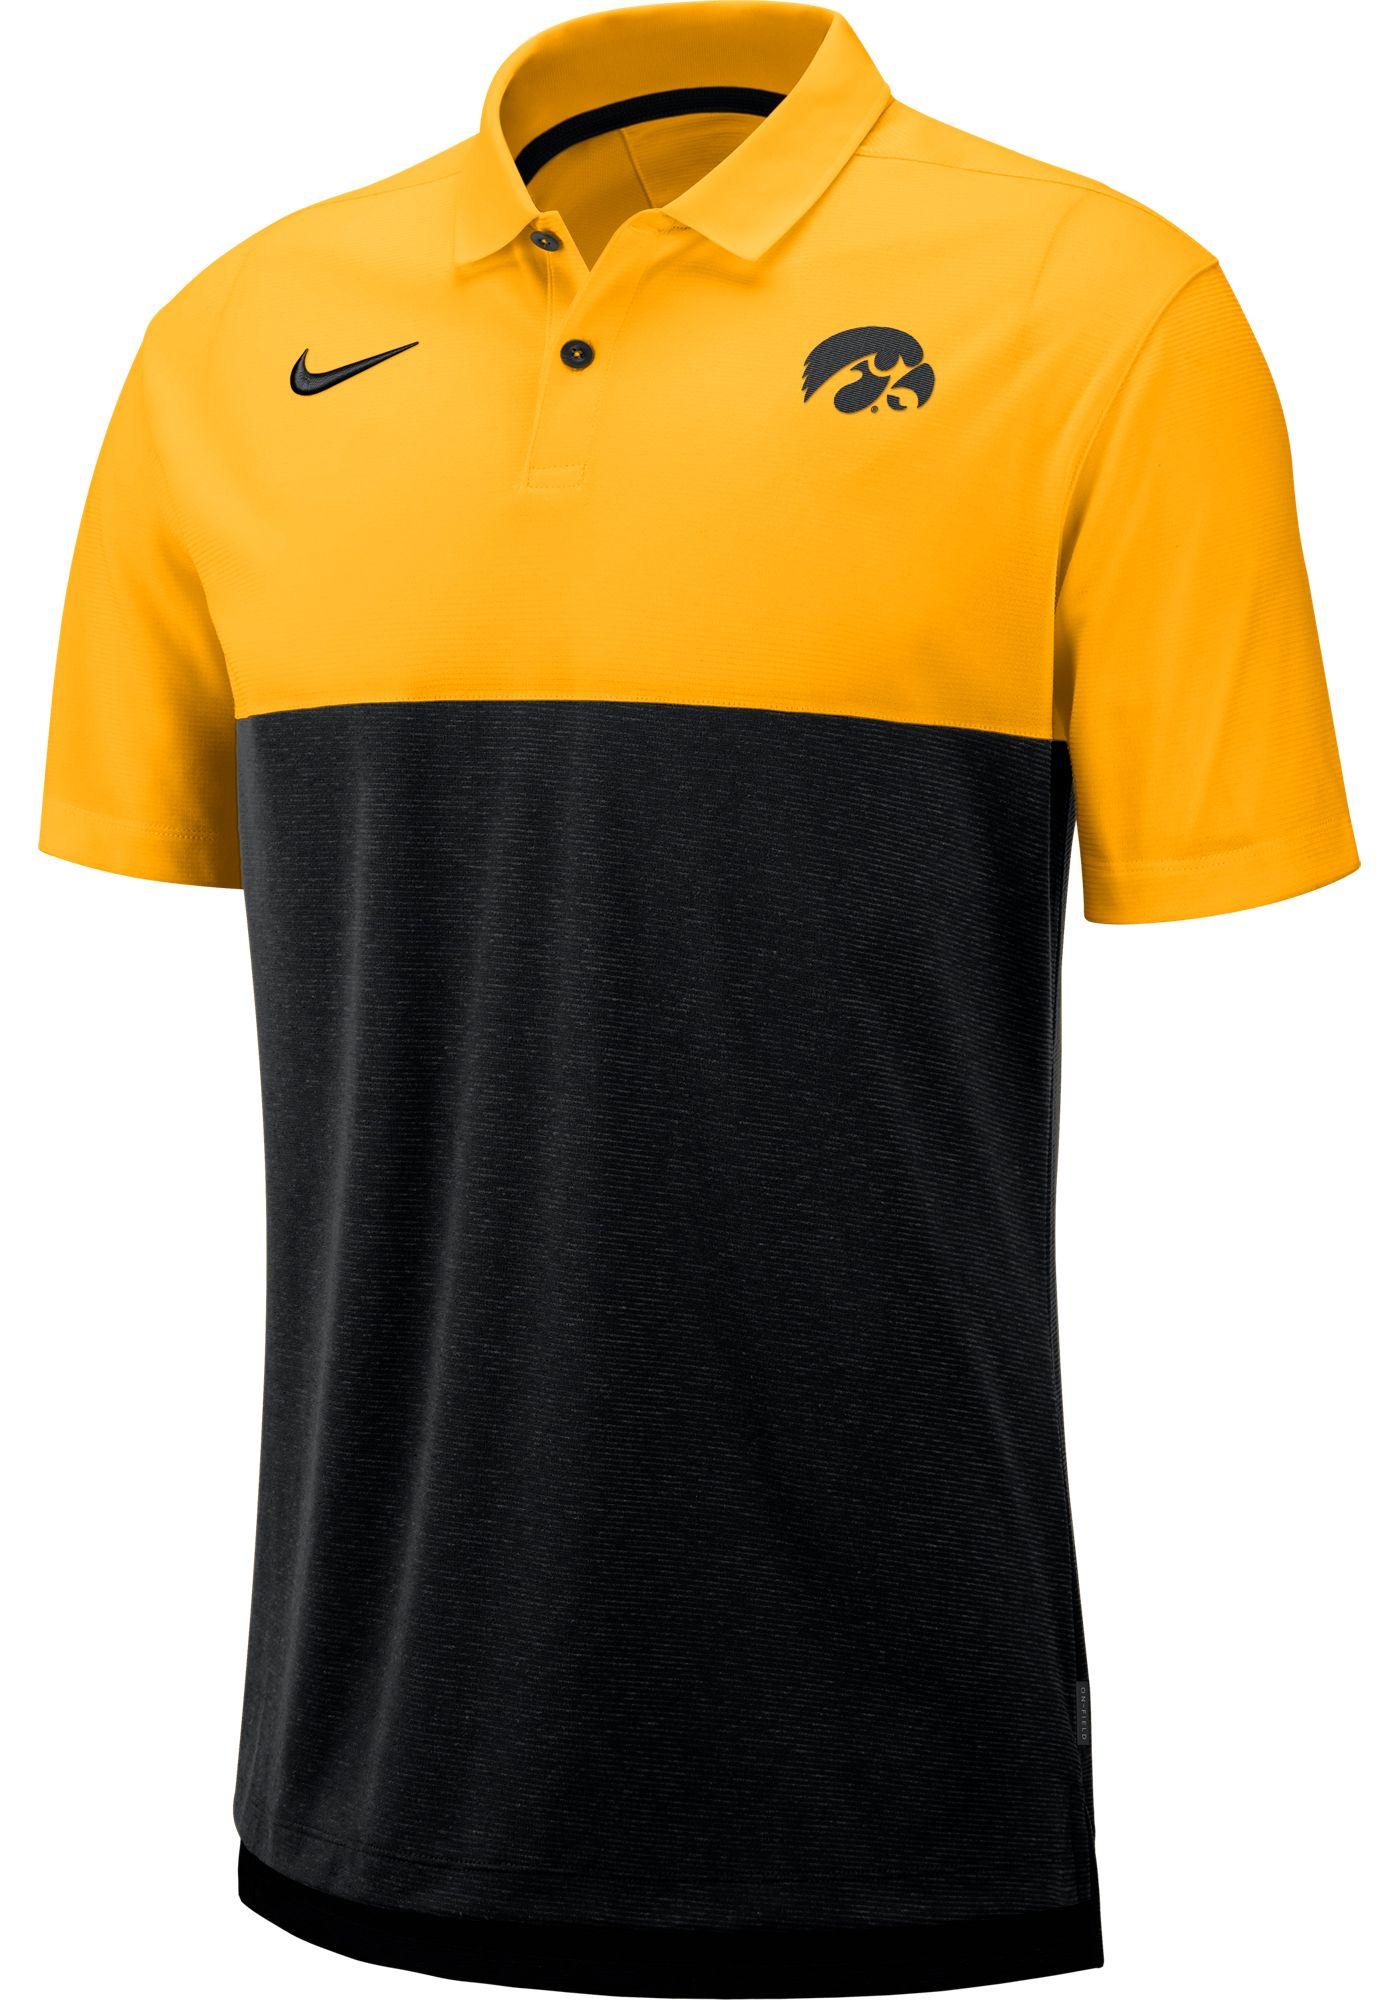 Nike Men's Iowa Hawkeyes Gold/Black Dri-FIT Breathe Football Sideline Polo